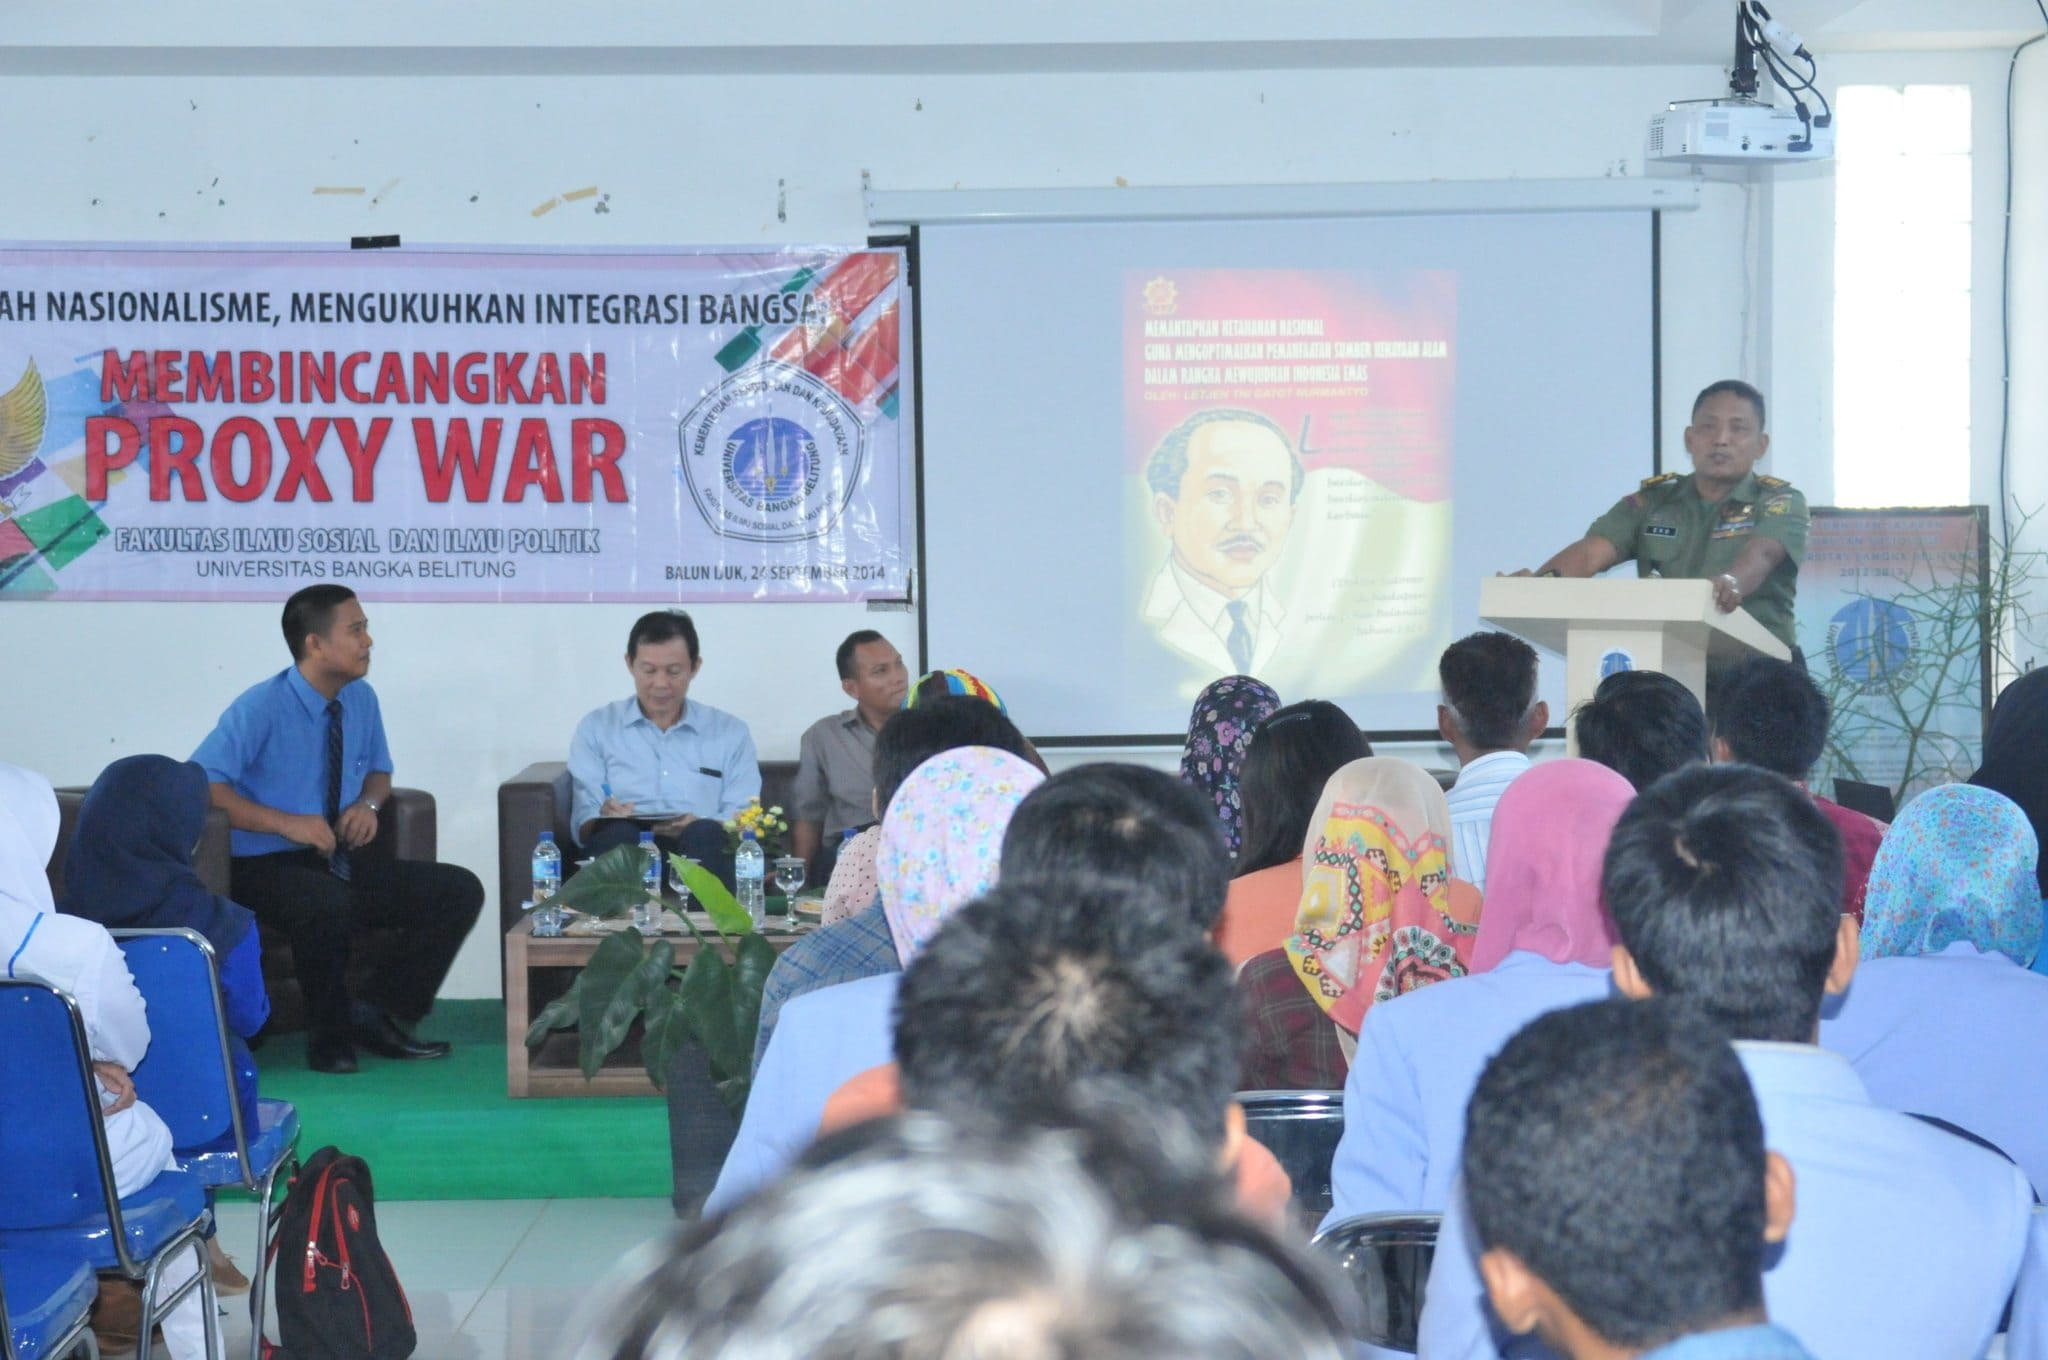 Kasrem Berbicara Proxy War Kepada Mahasiswa UBB